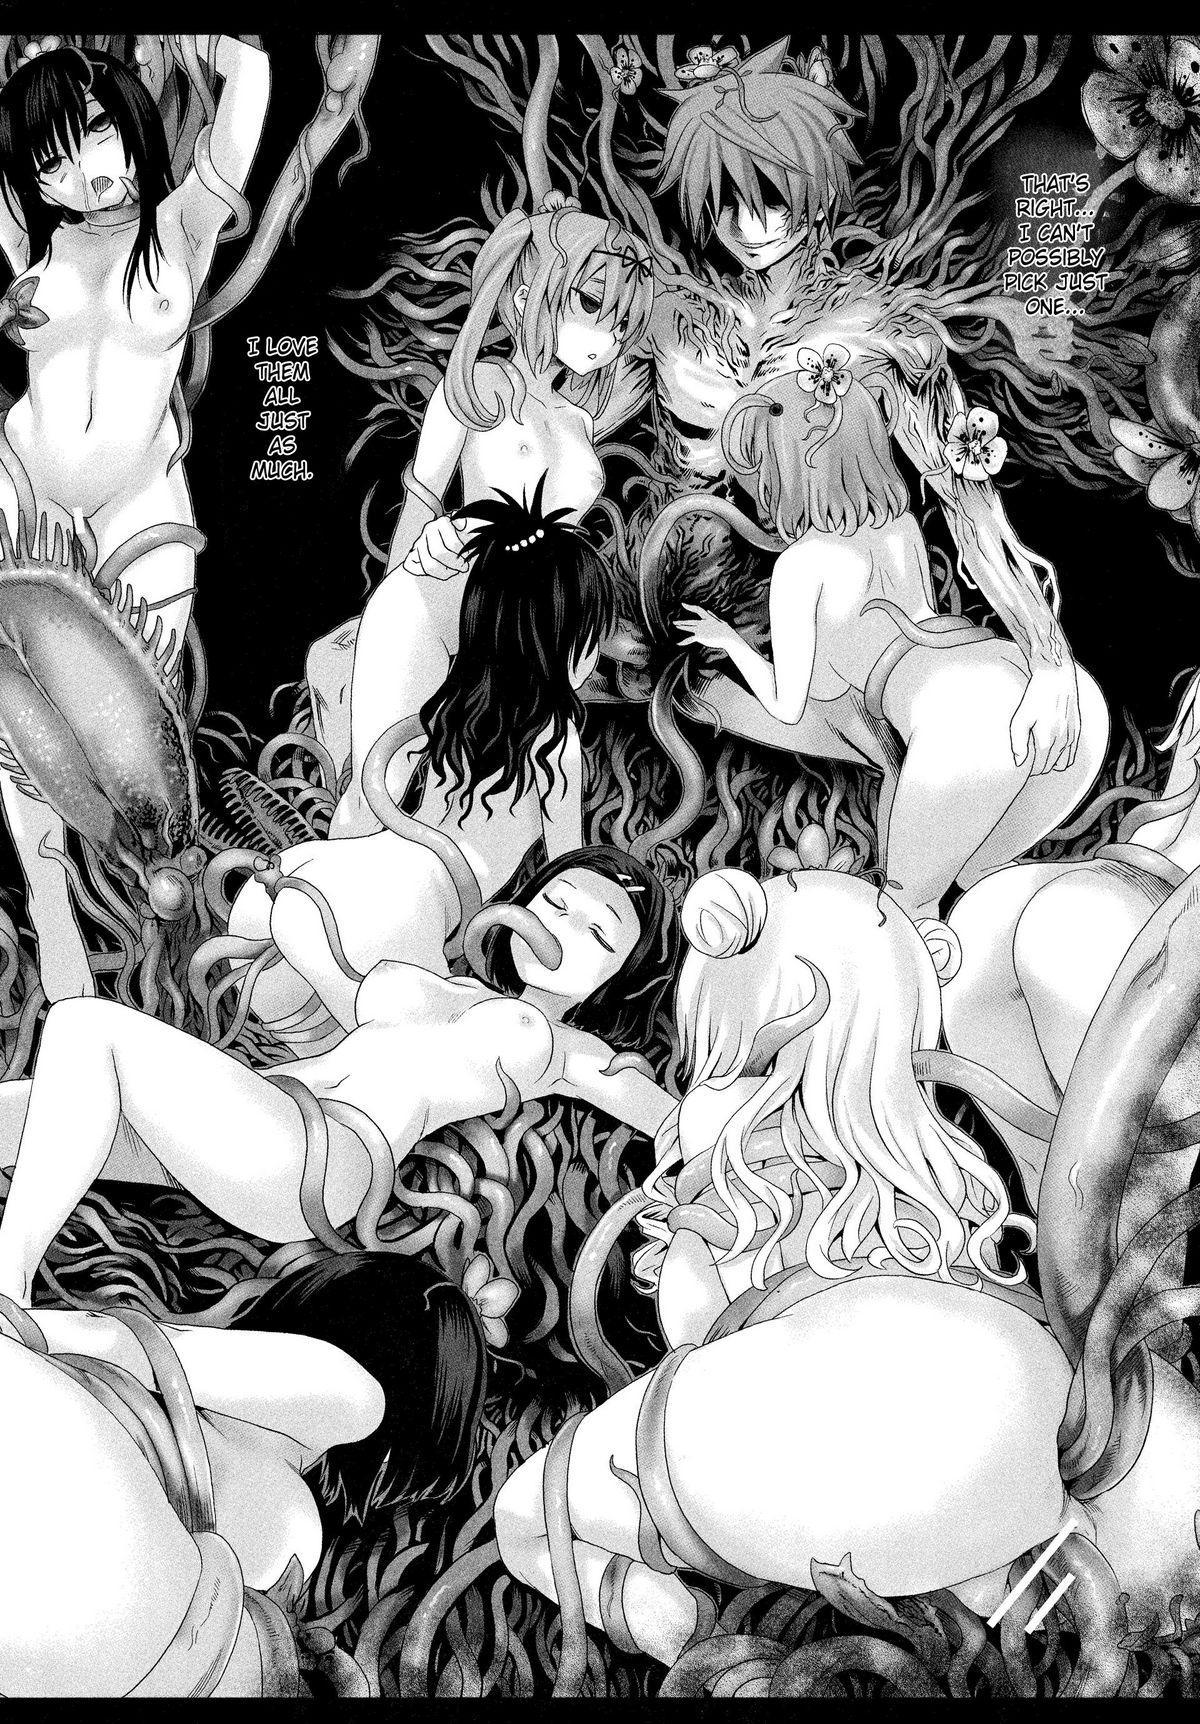 Victim Girls 8 - Venus Trap 21